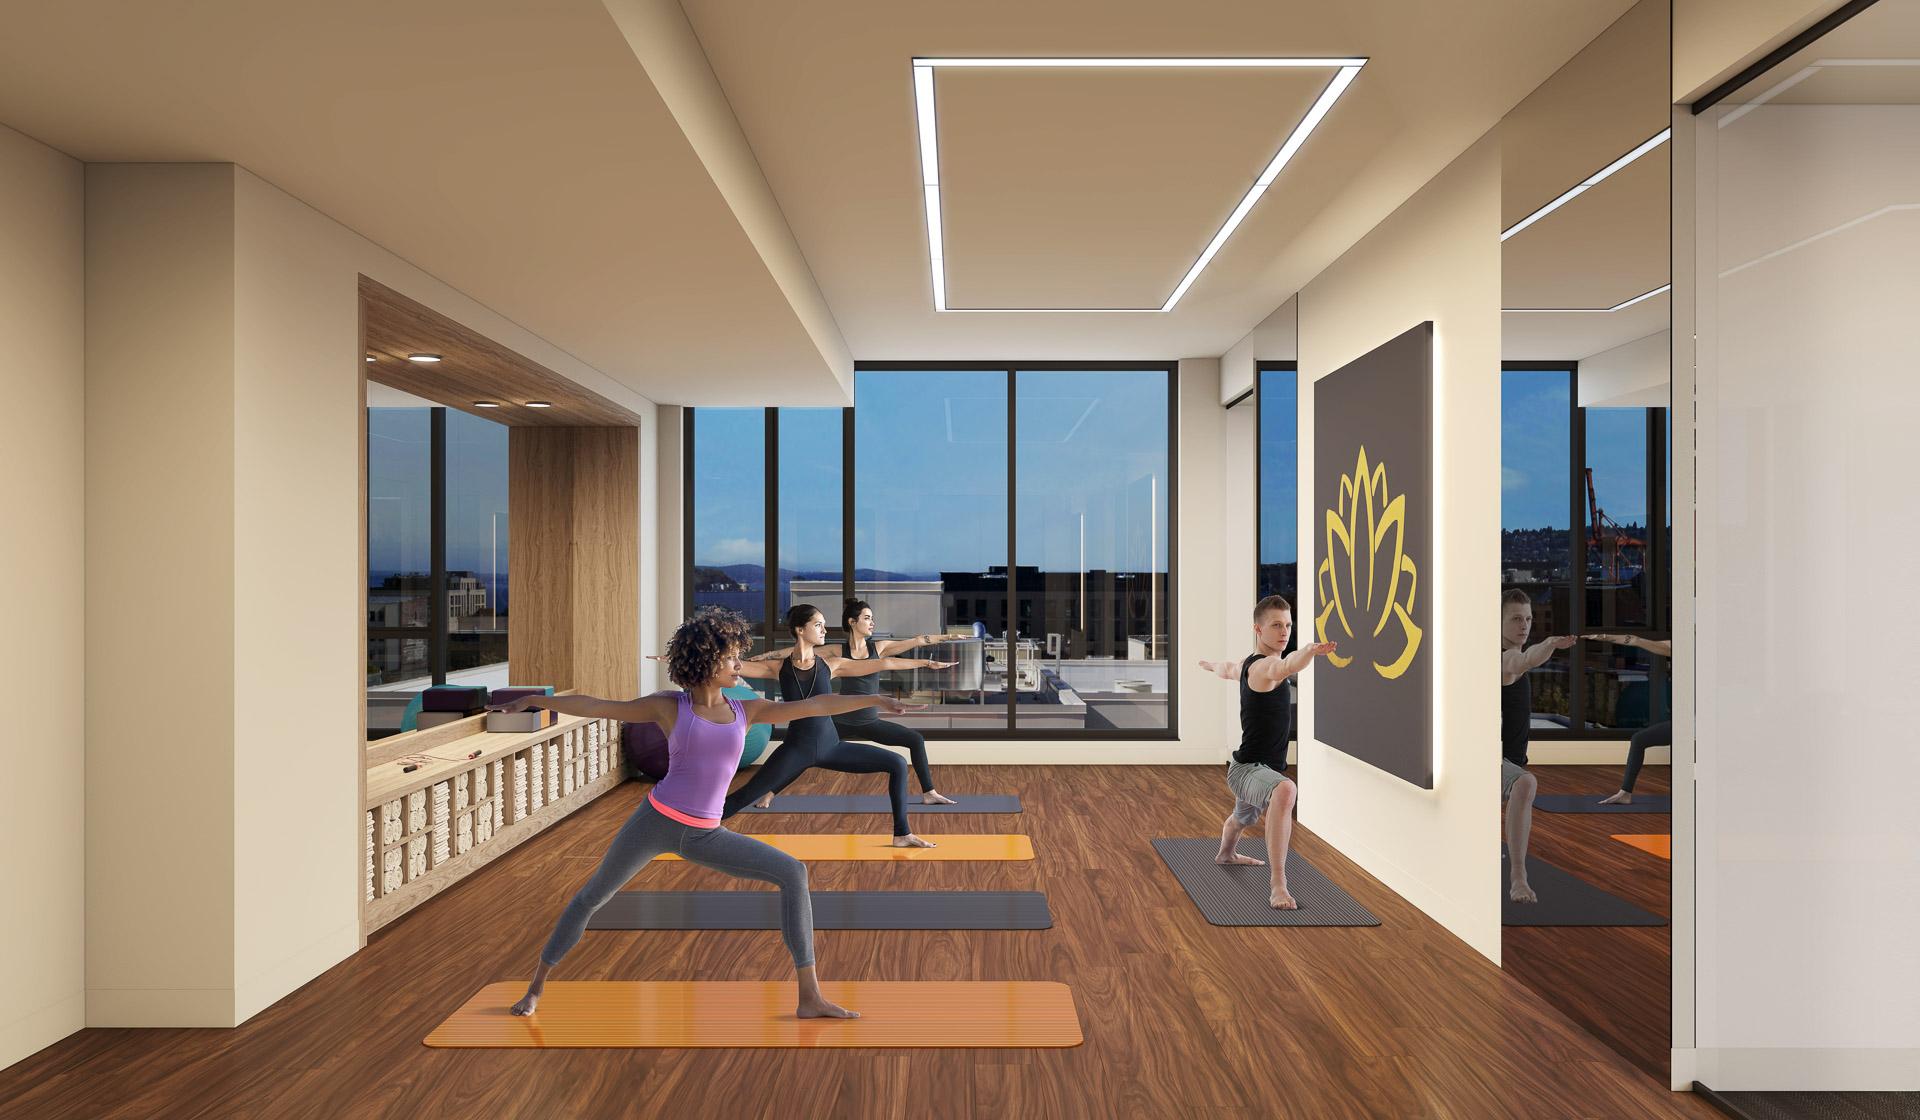 KODA_Interior7th_Yoga_Cam1_031919